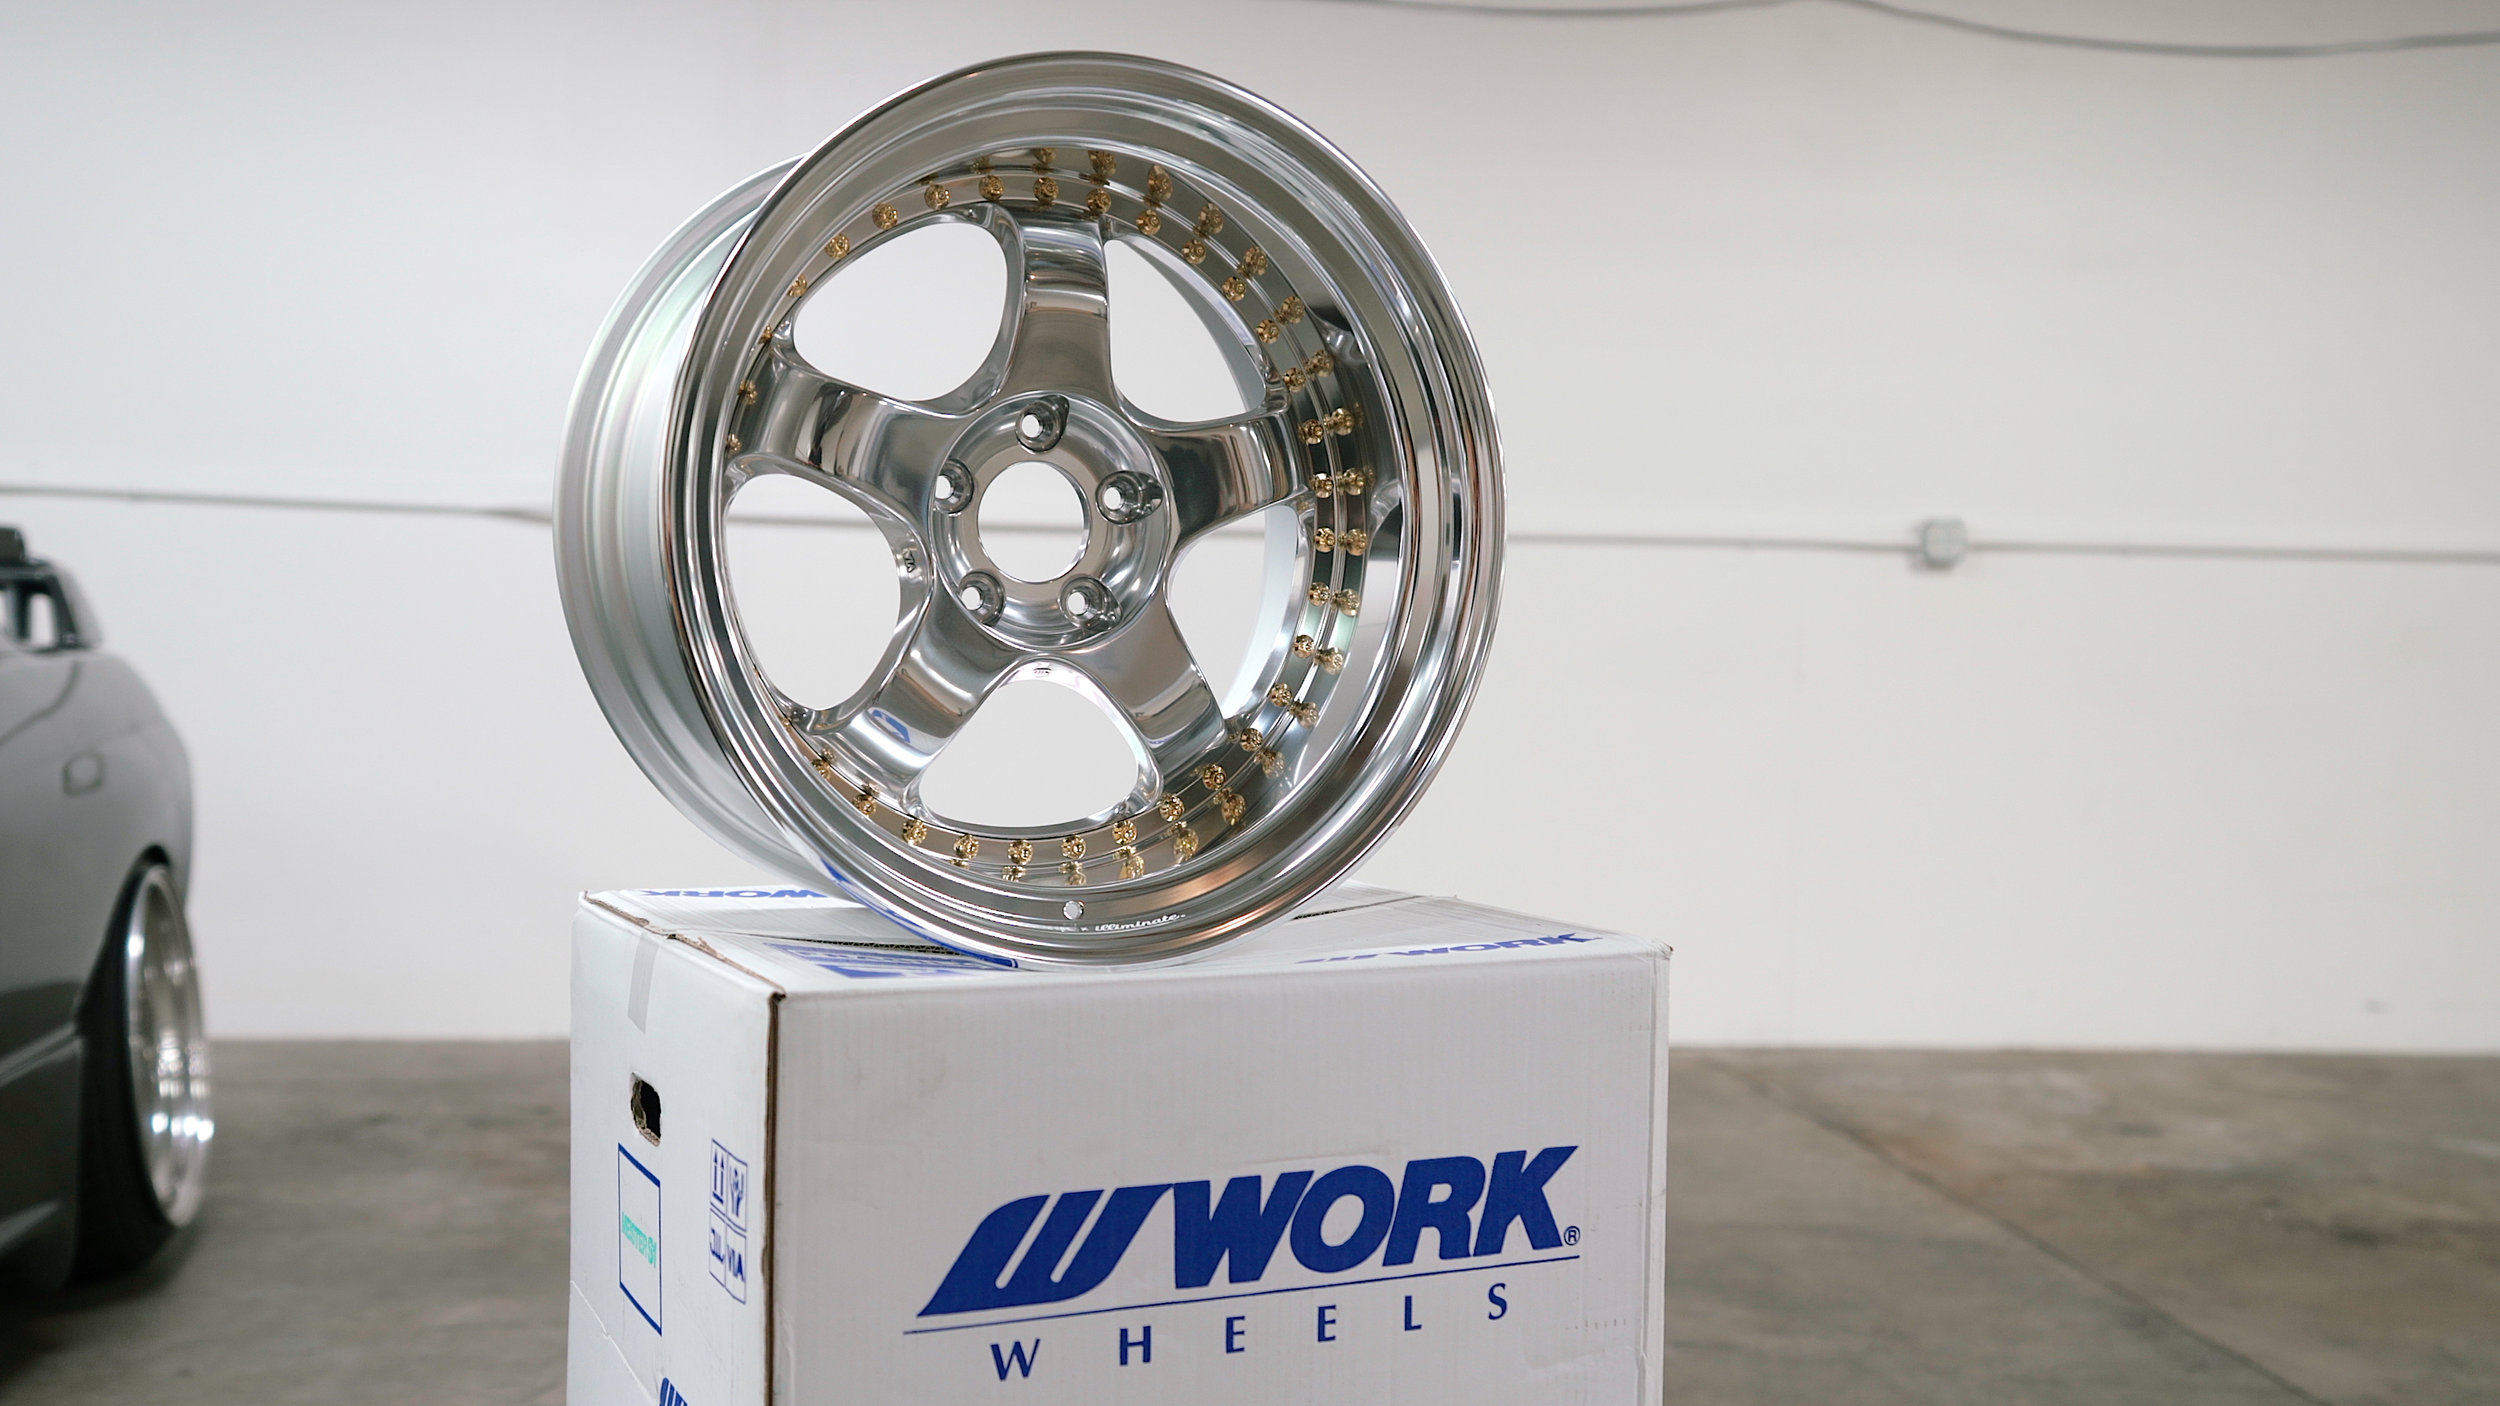 work wheels web 3.jpeg